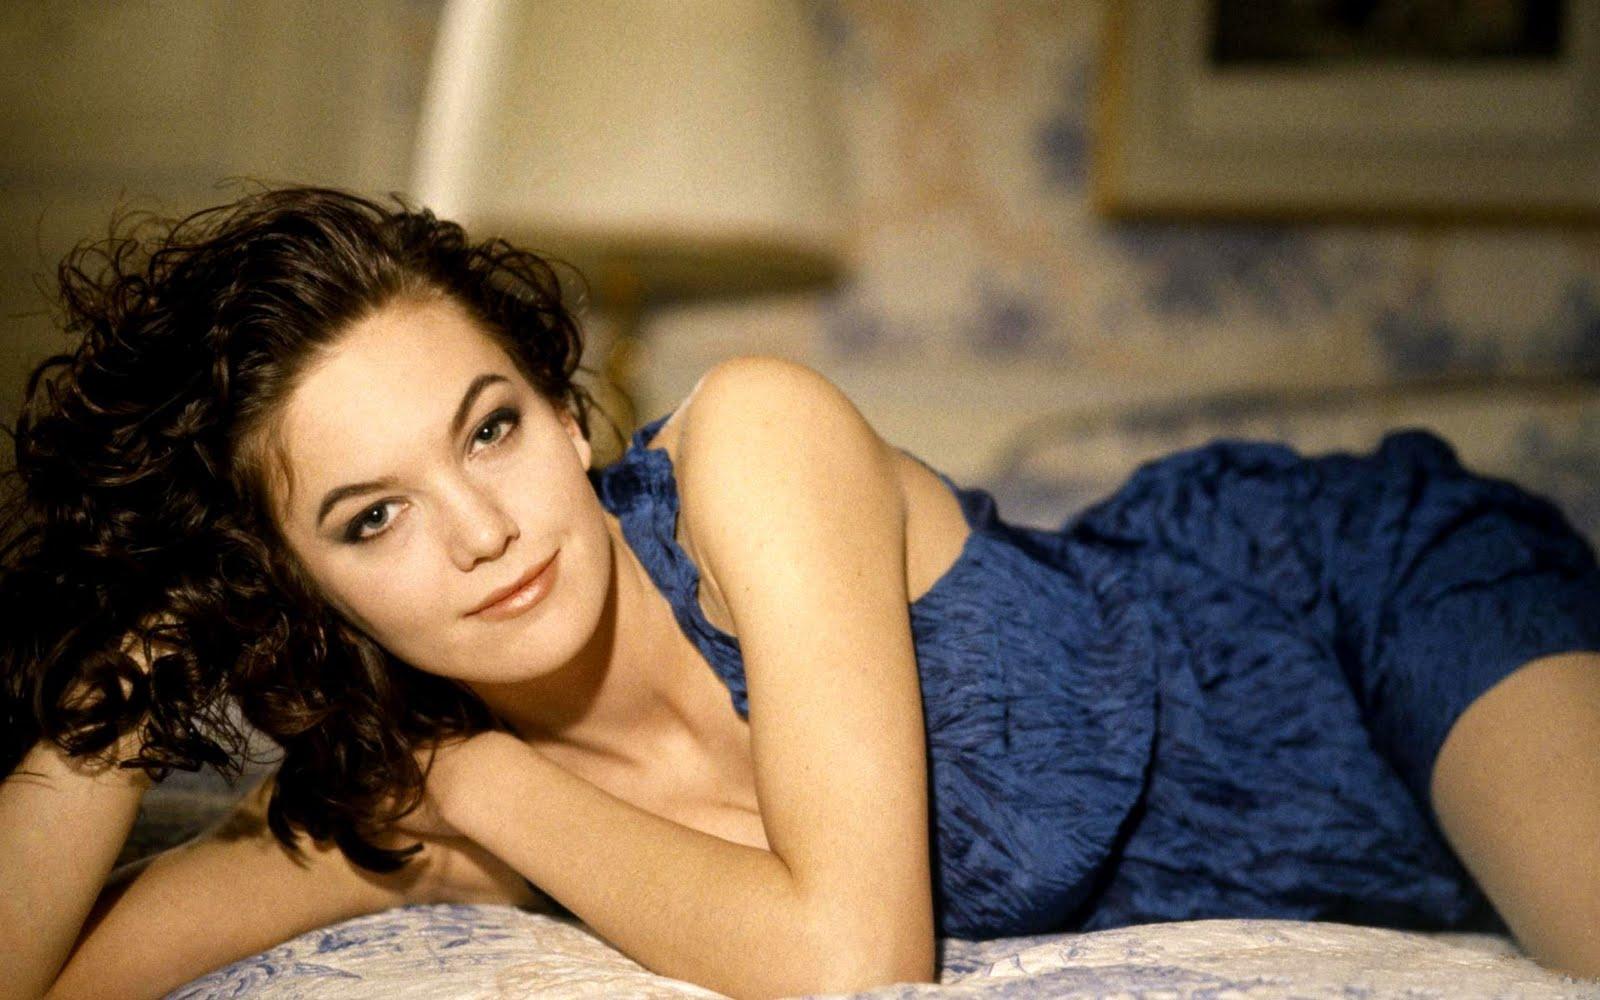 Diane Lane Gallery Hollywood Actress Wallpapers HD 1600x1000